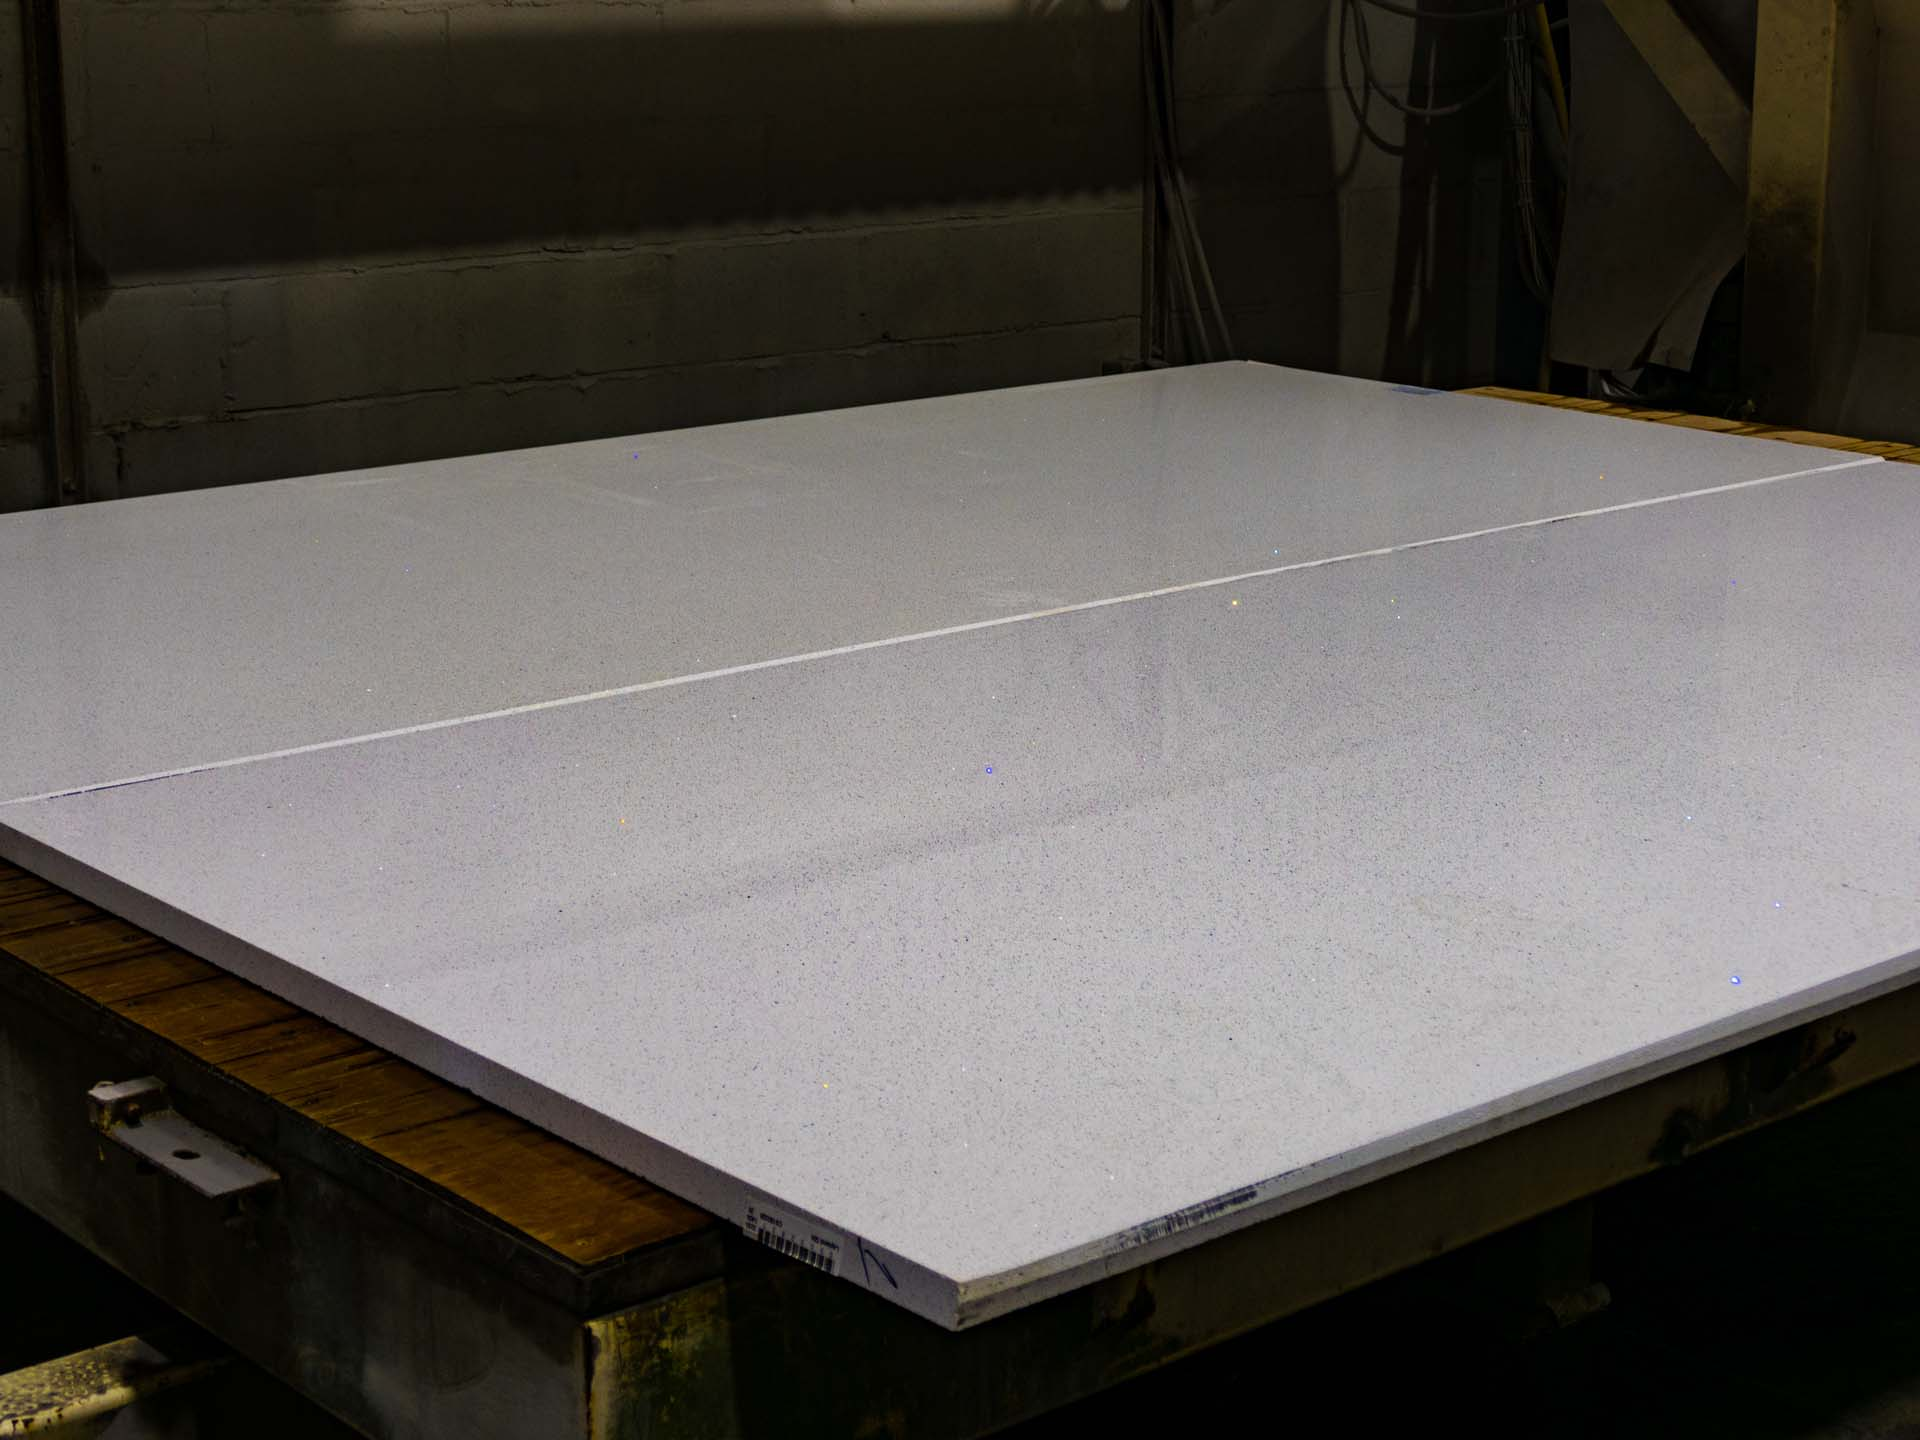 quartz-worktops-slab-variation-083916-1